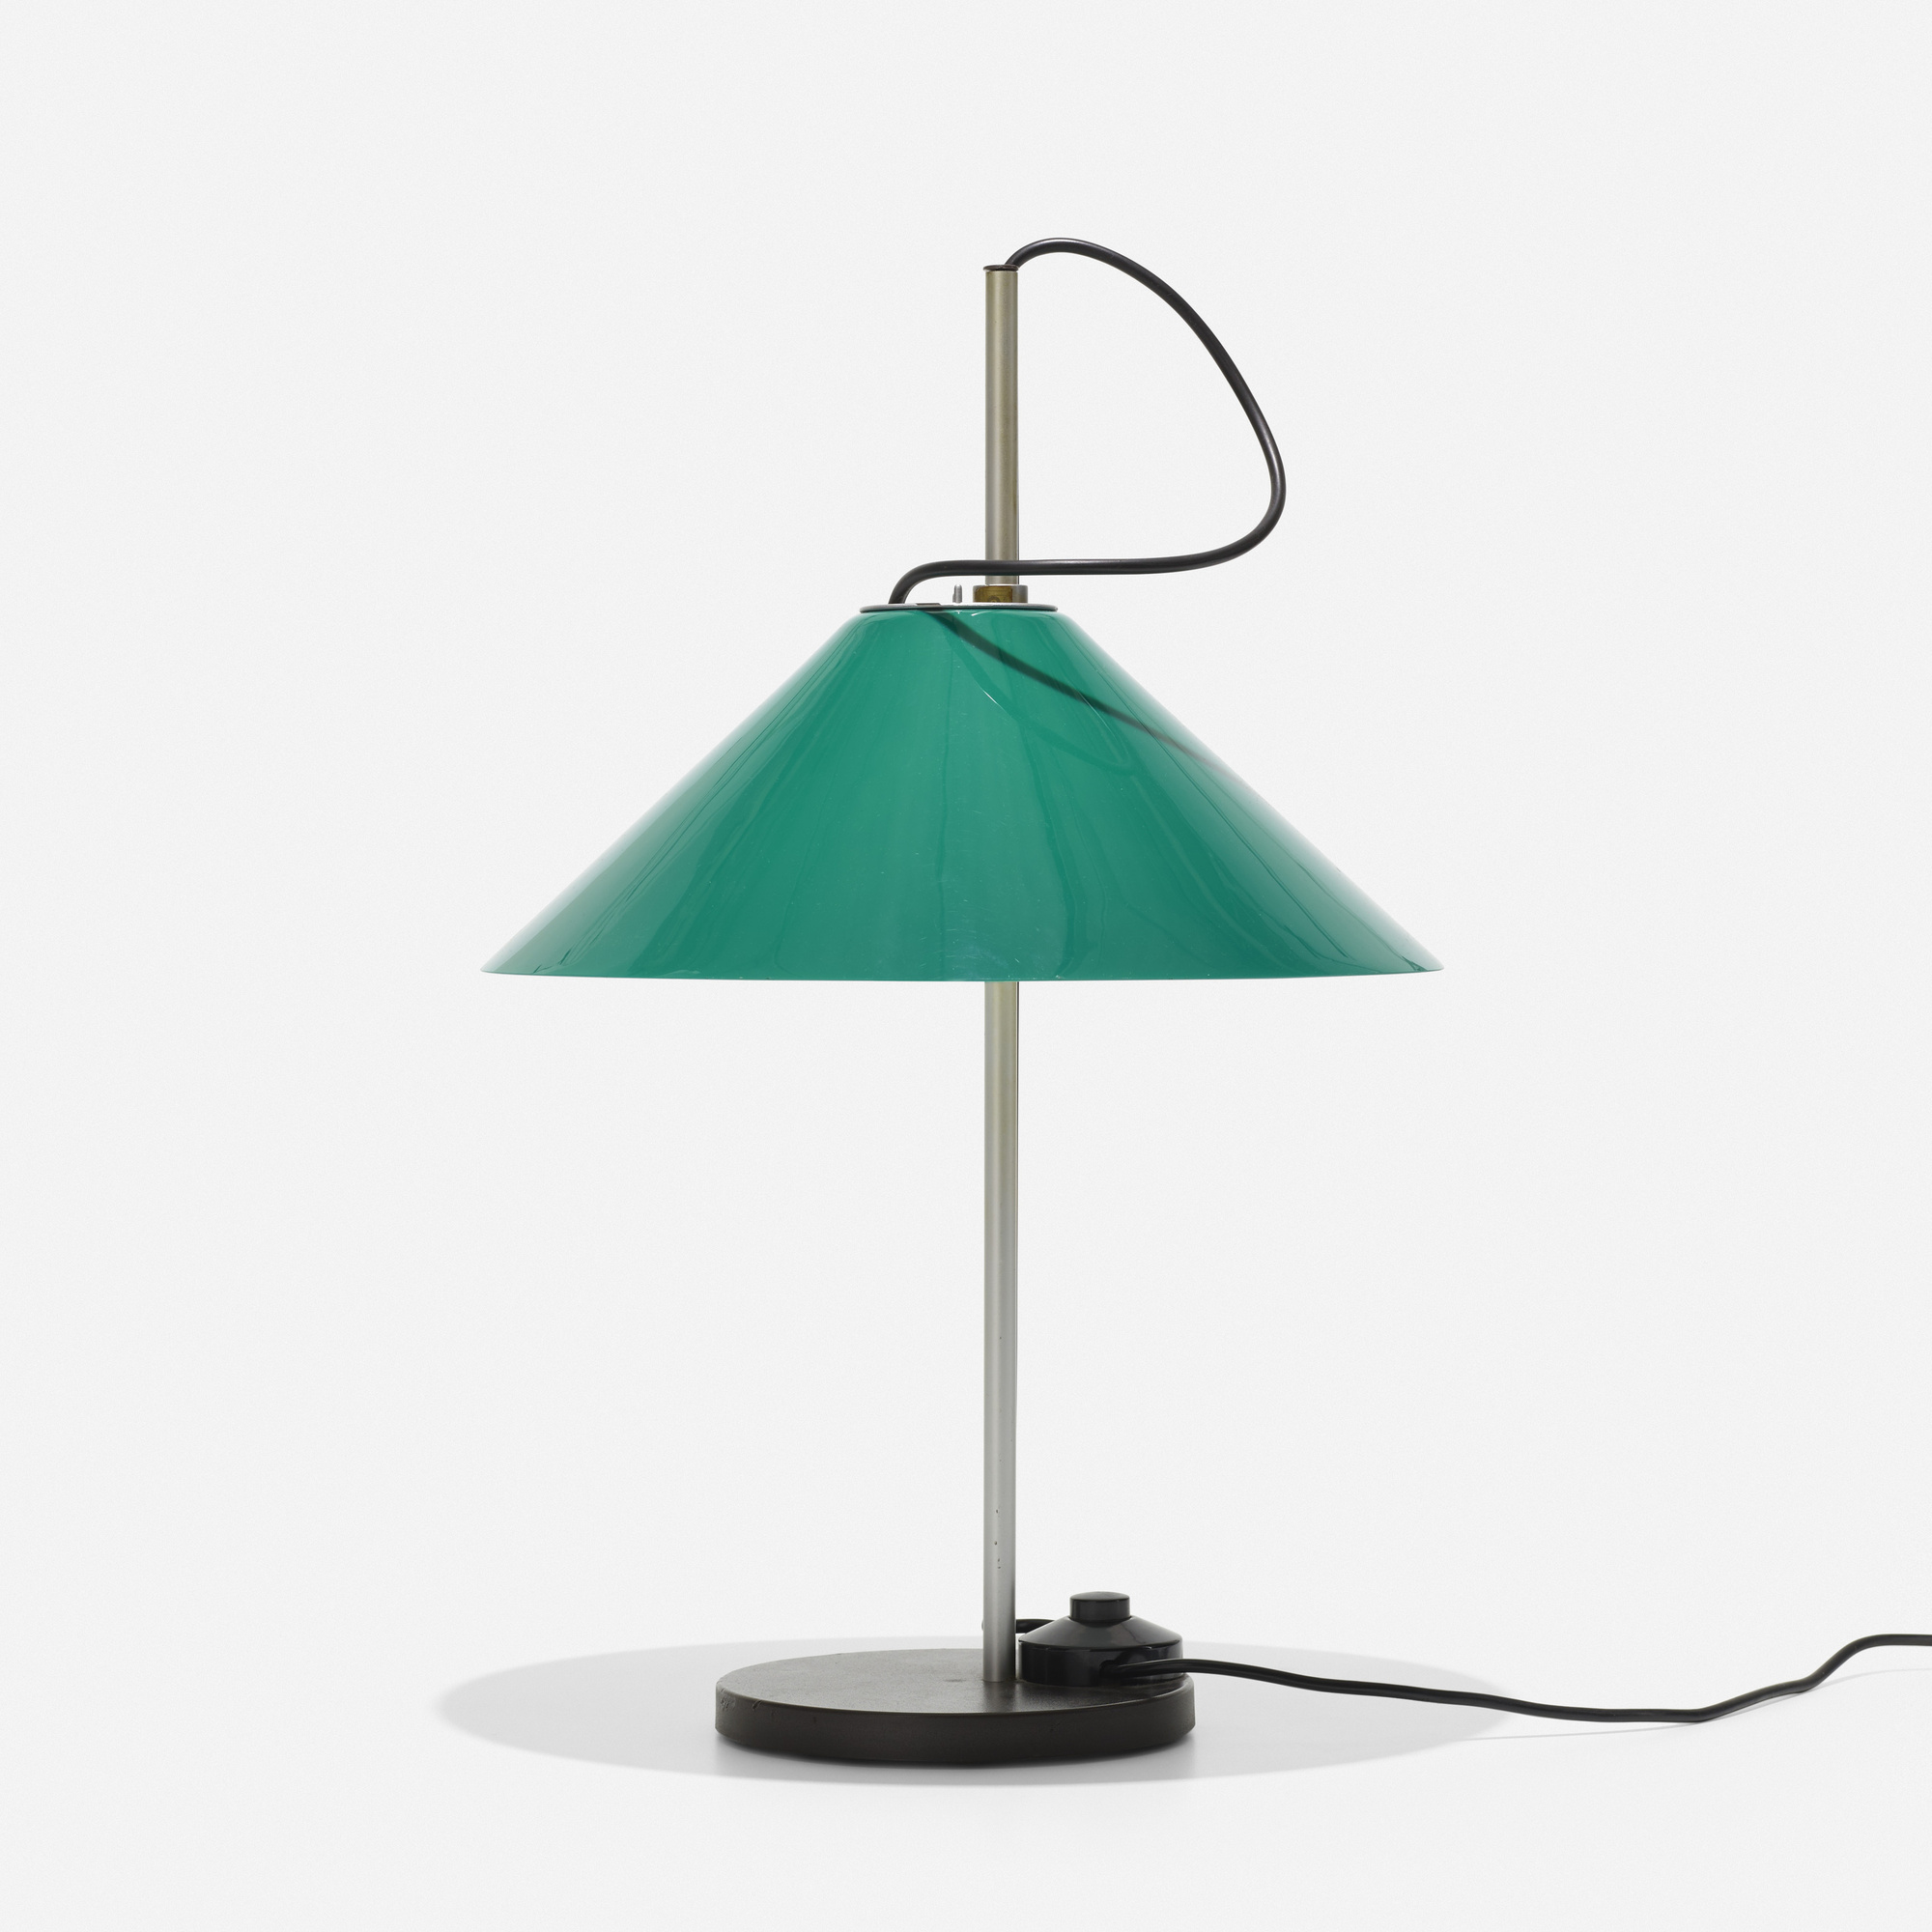 183: Enzo Mari and Giancarlo Fassina / Aggregato table lamp (1 of 1)